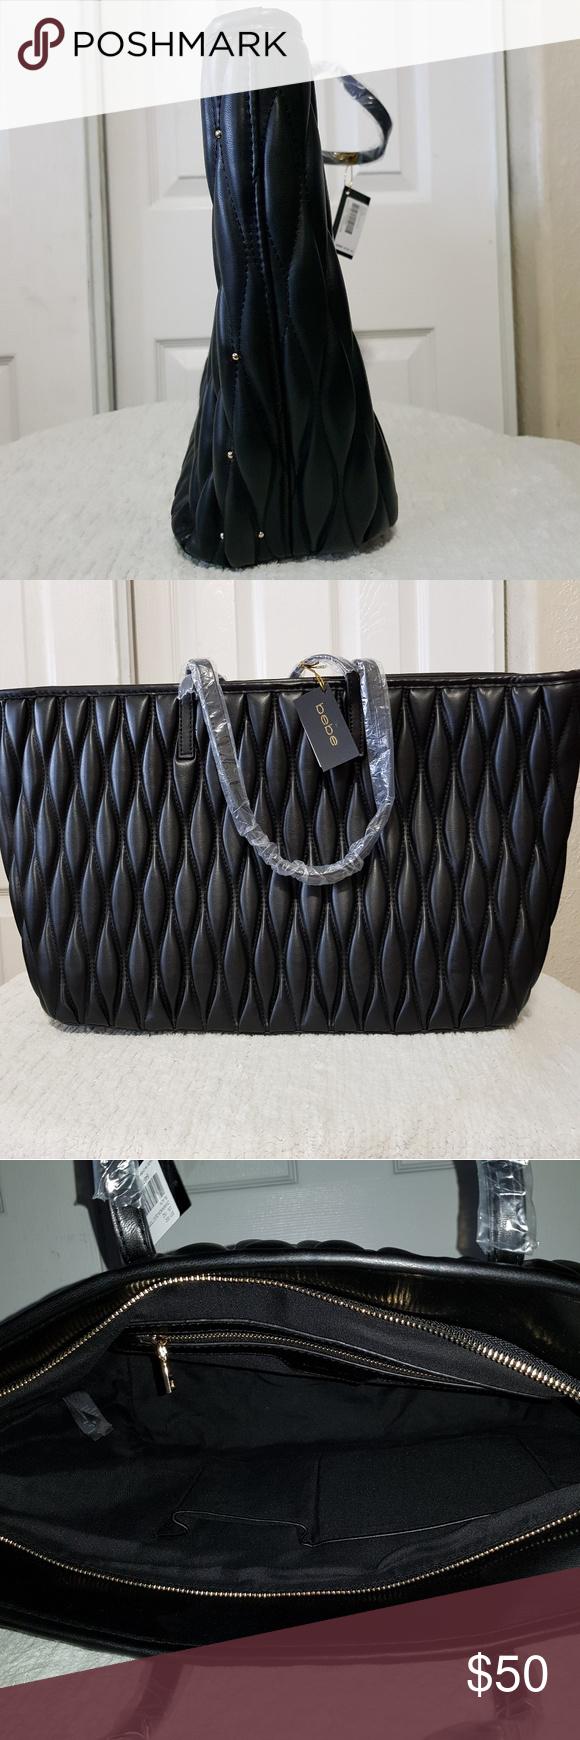 29dc799bca BEBE Diamanda Quilt Tote Diamond-quilted faux leather exterior, inset zip  top closure, , interior zip and slip pockets 16